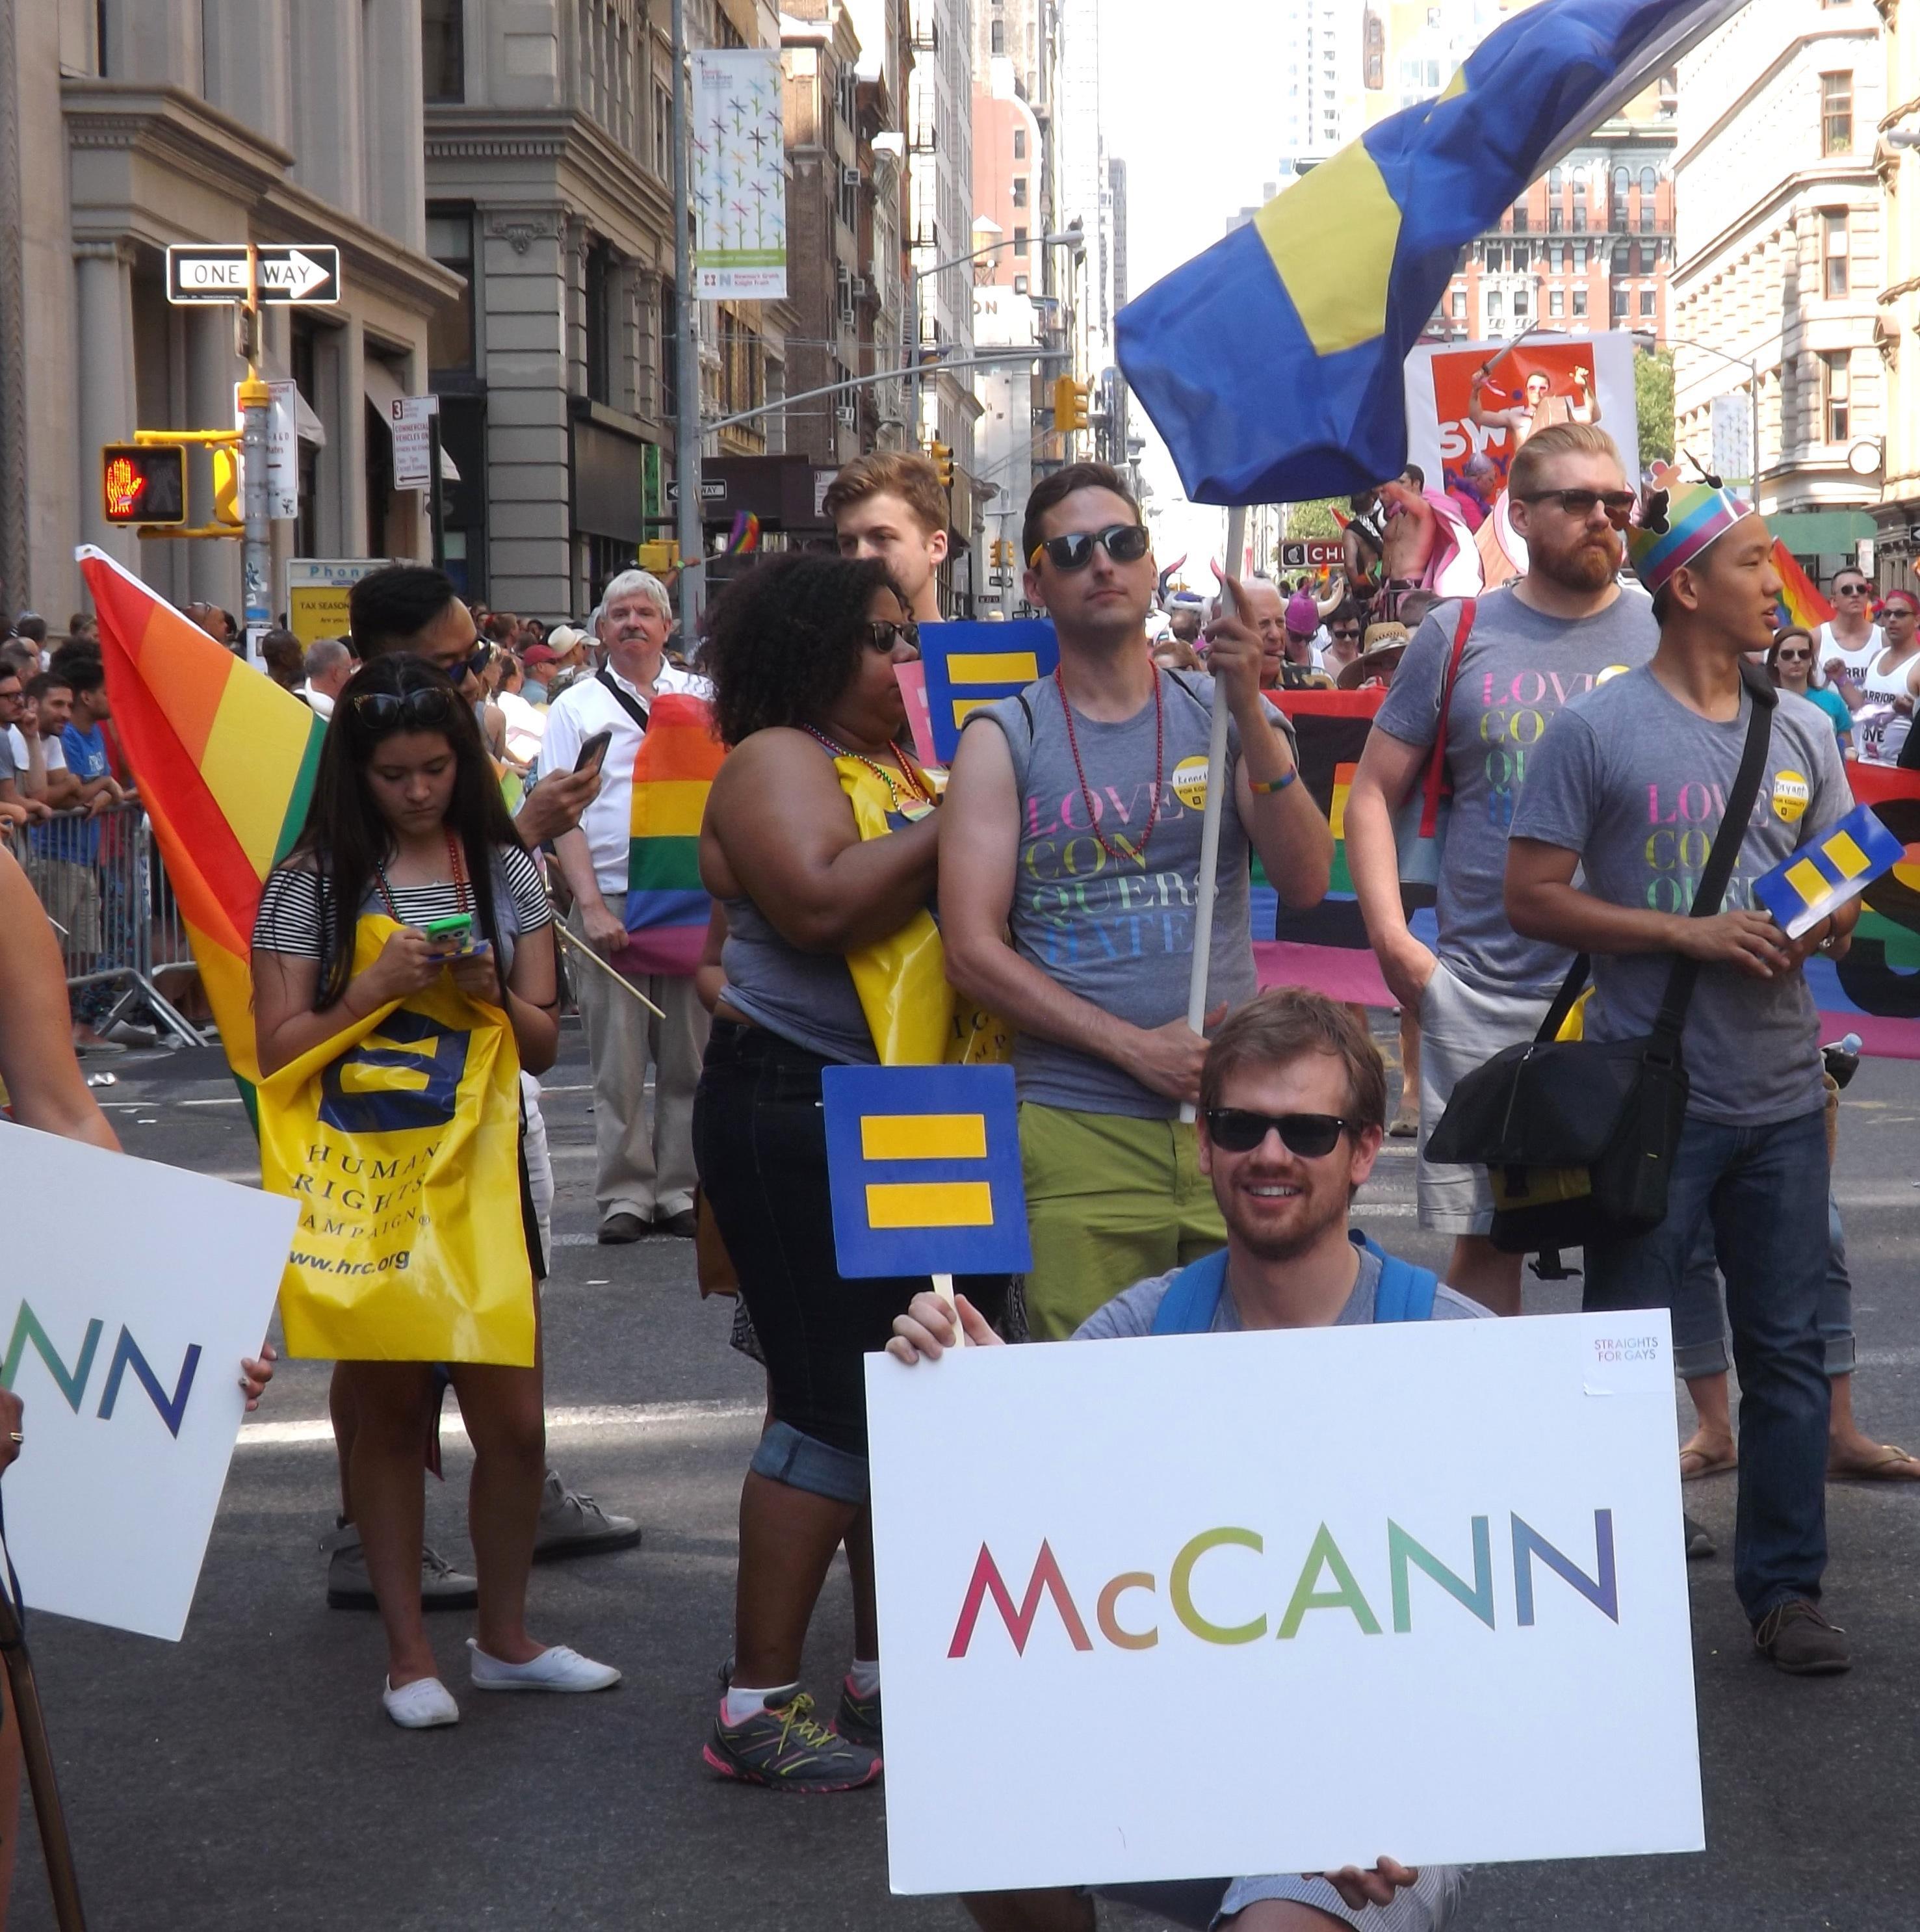 2014-07-01-McCannHRCcrop.JPG